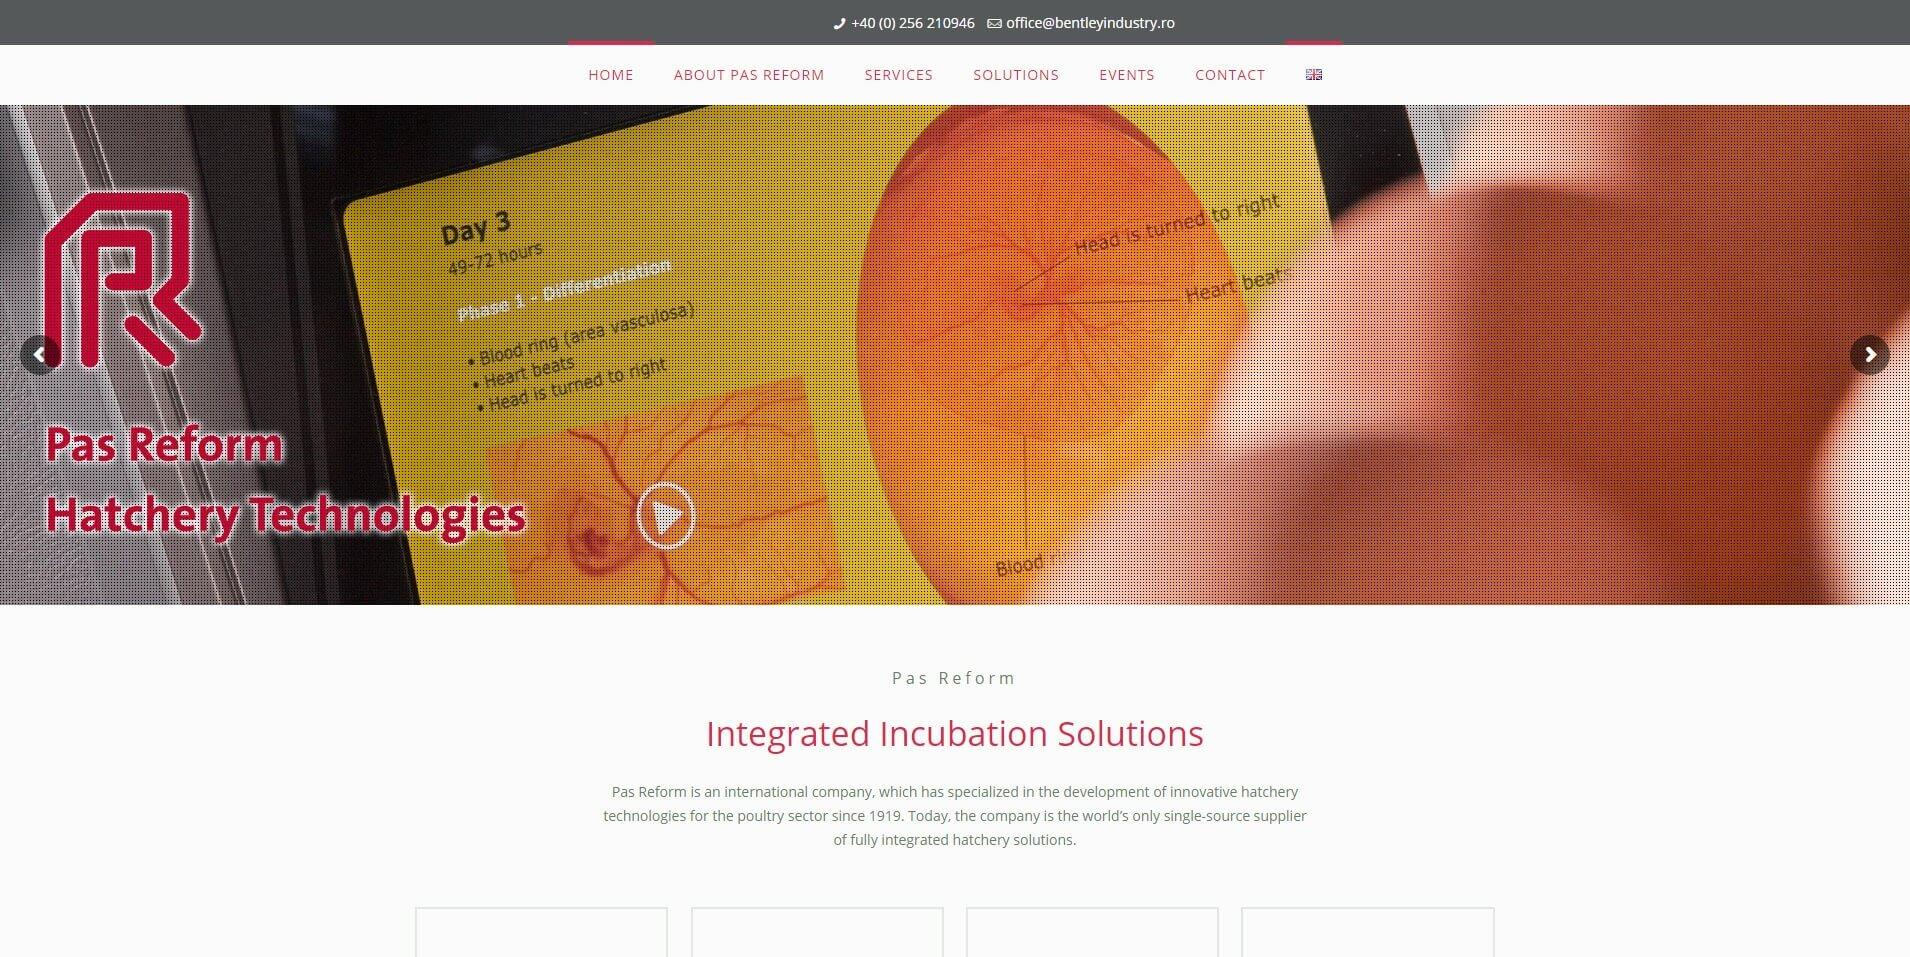 Portofoliu Web Design Timisoara - Pas Reform